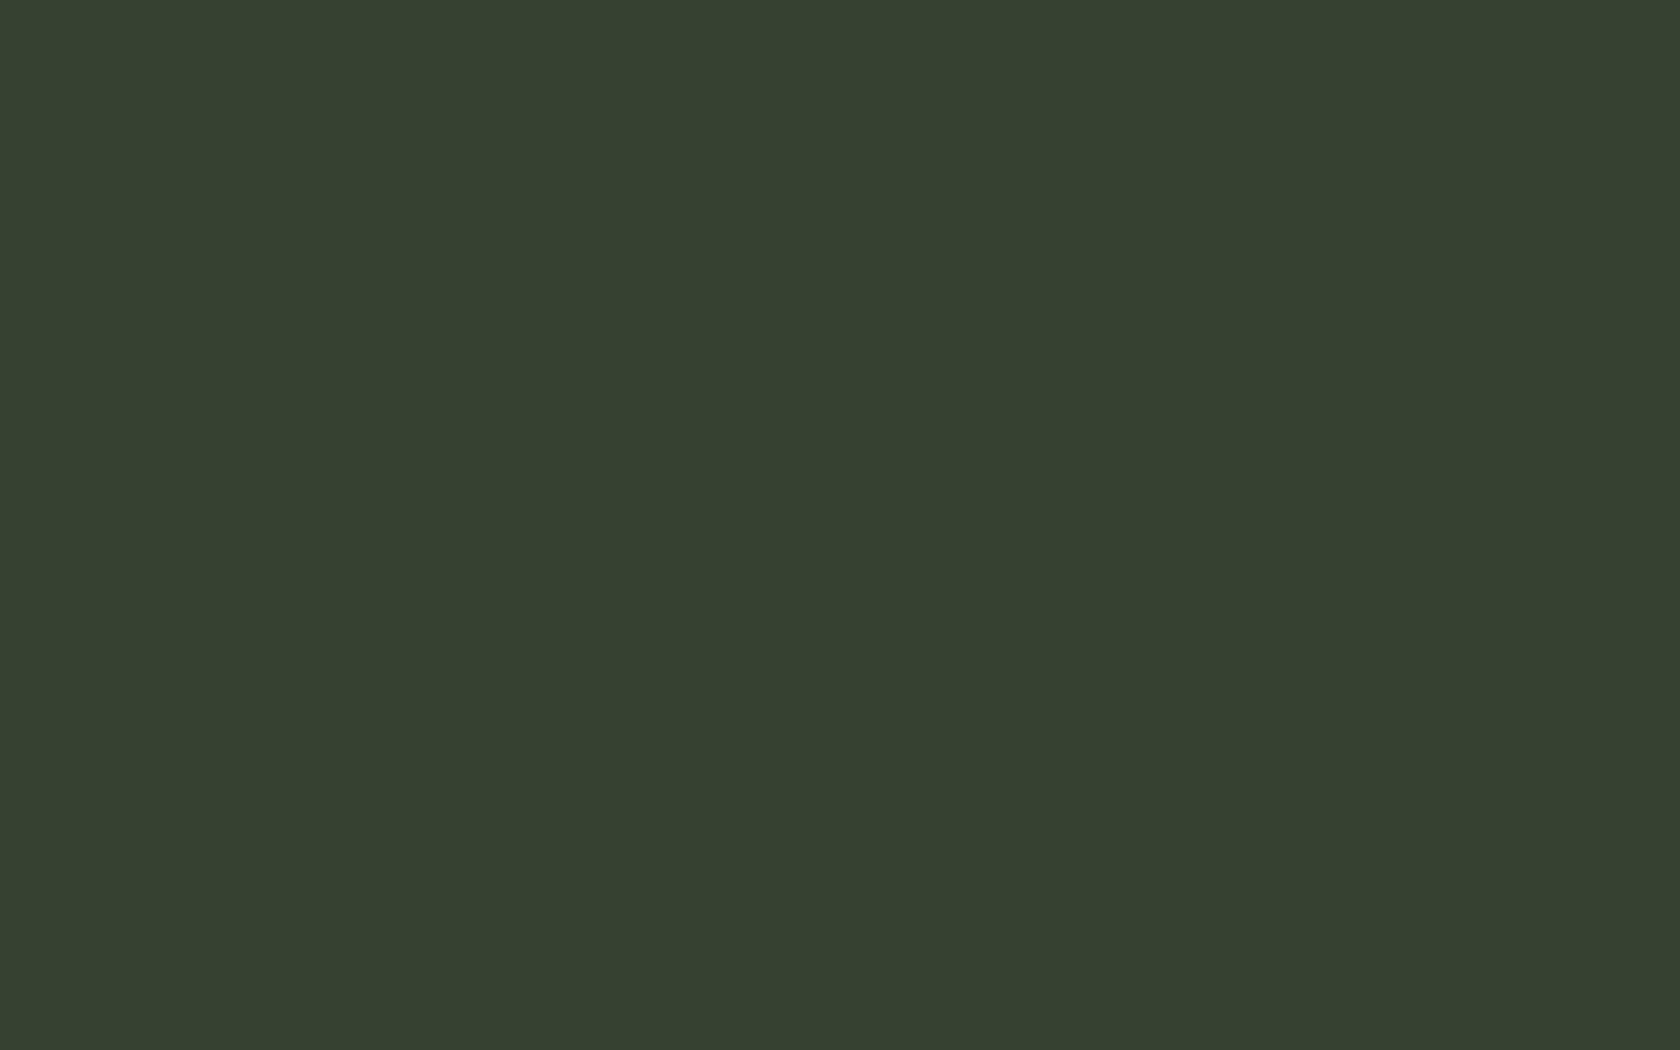 1680x1050 Kombu Green Solid Color Background